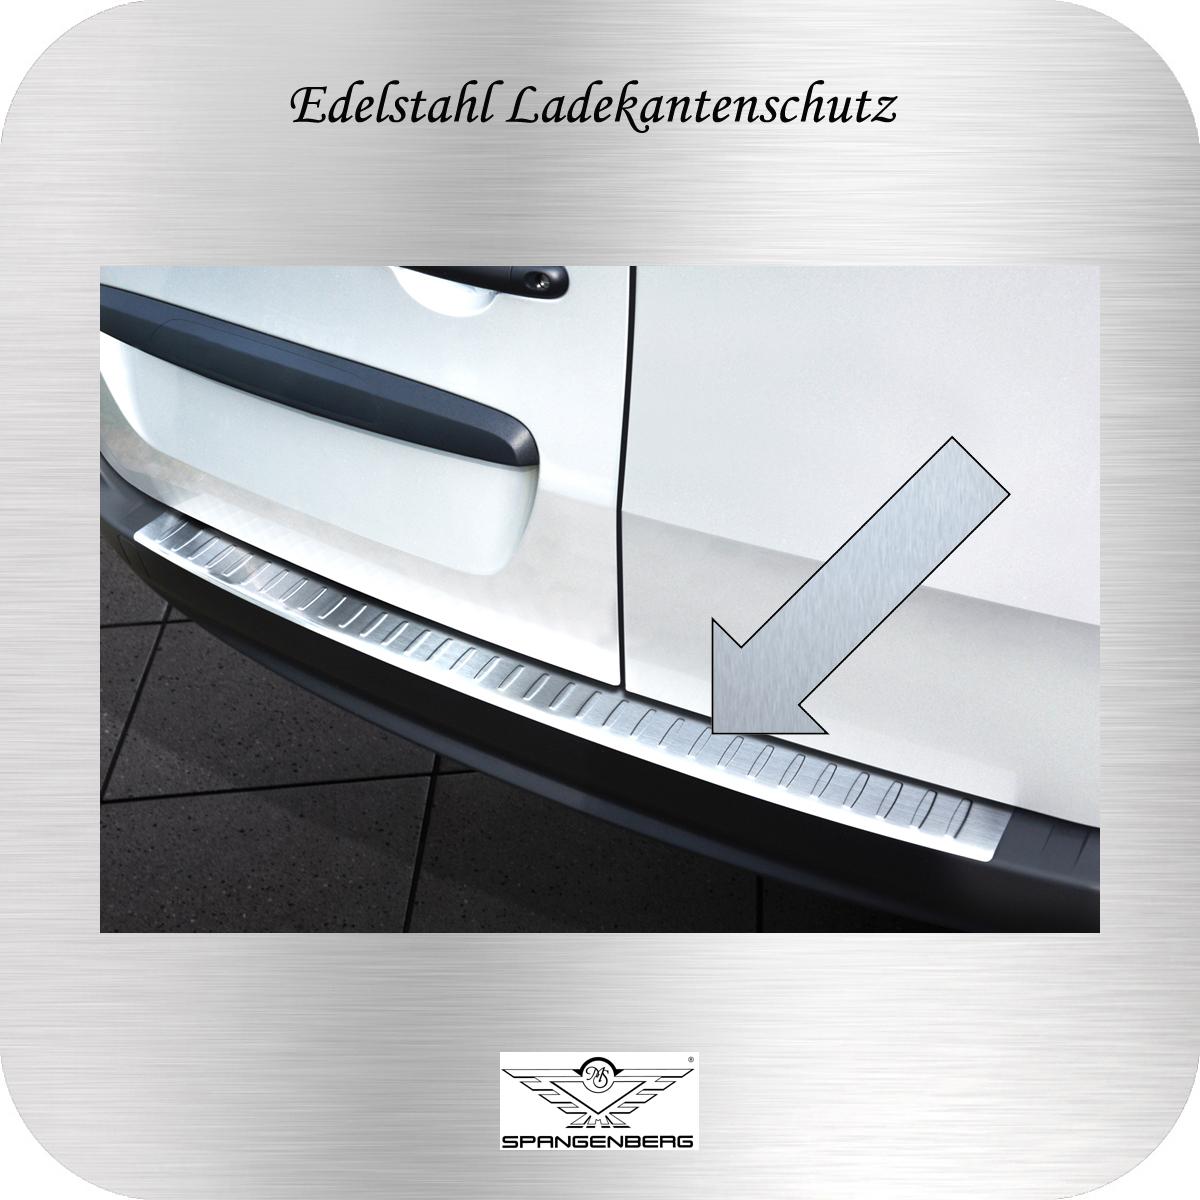 Ladekantenschutz Edelstahl Mercedes Citan 2012- 3235825